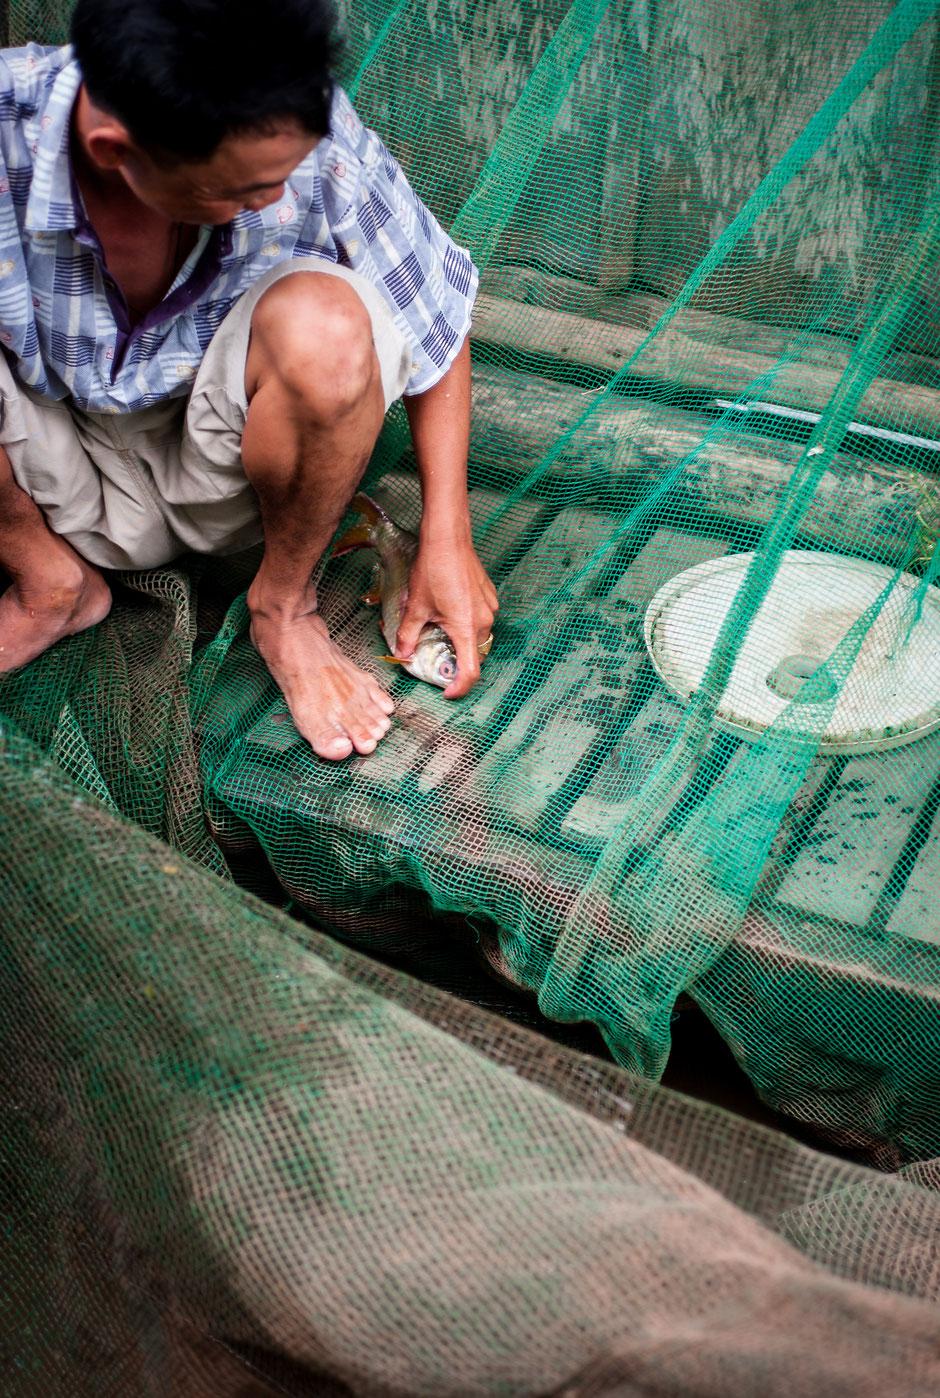 Fishermen, Mekong River, Vietnam, 2016